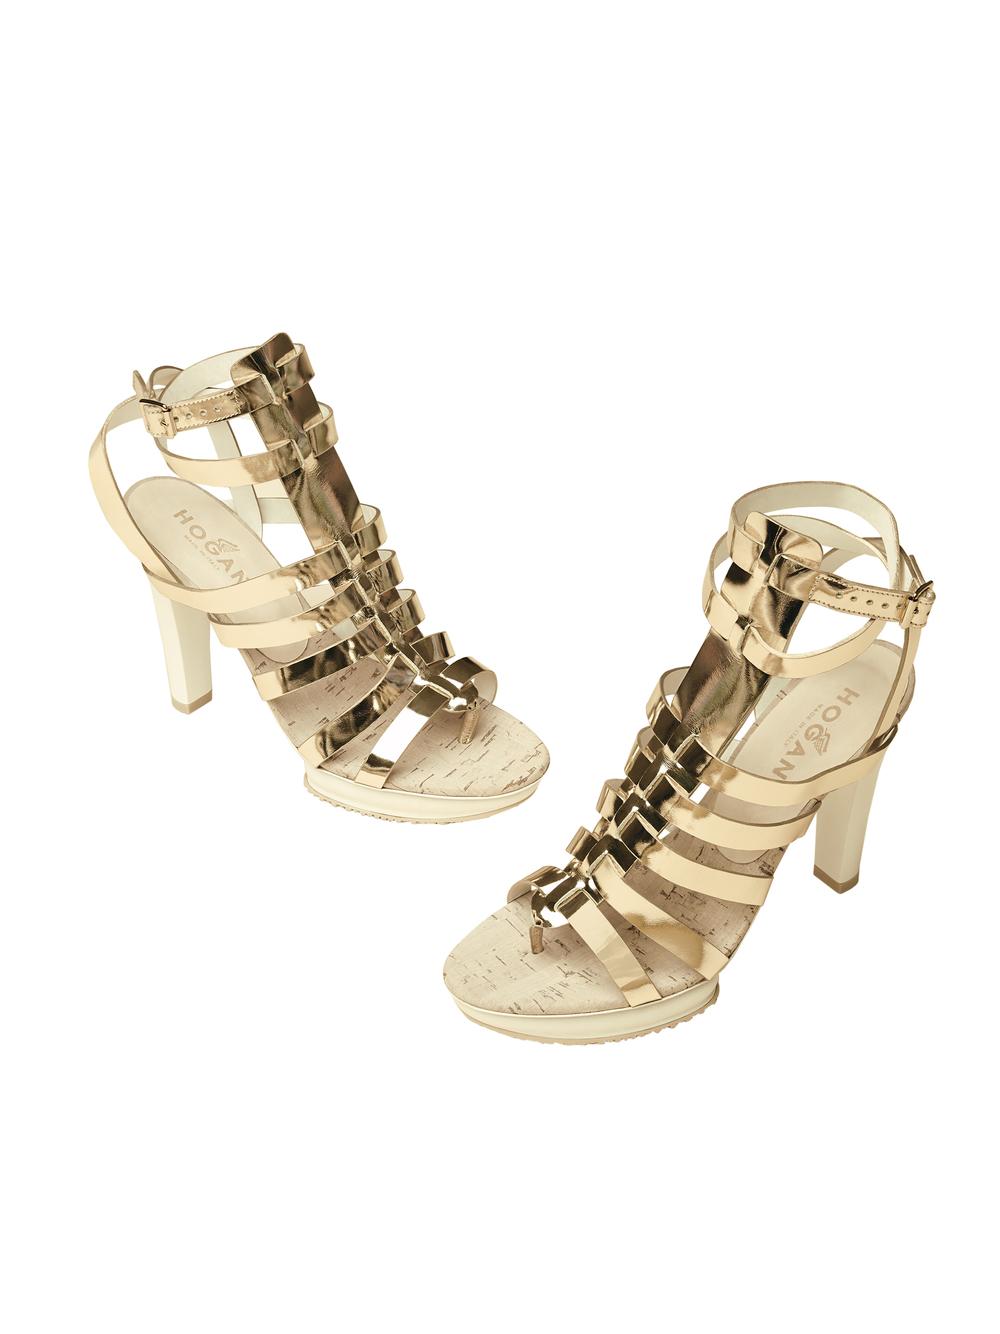 07-gladiator sandals in metallic gold leather.jpg